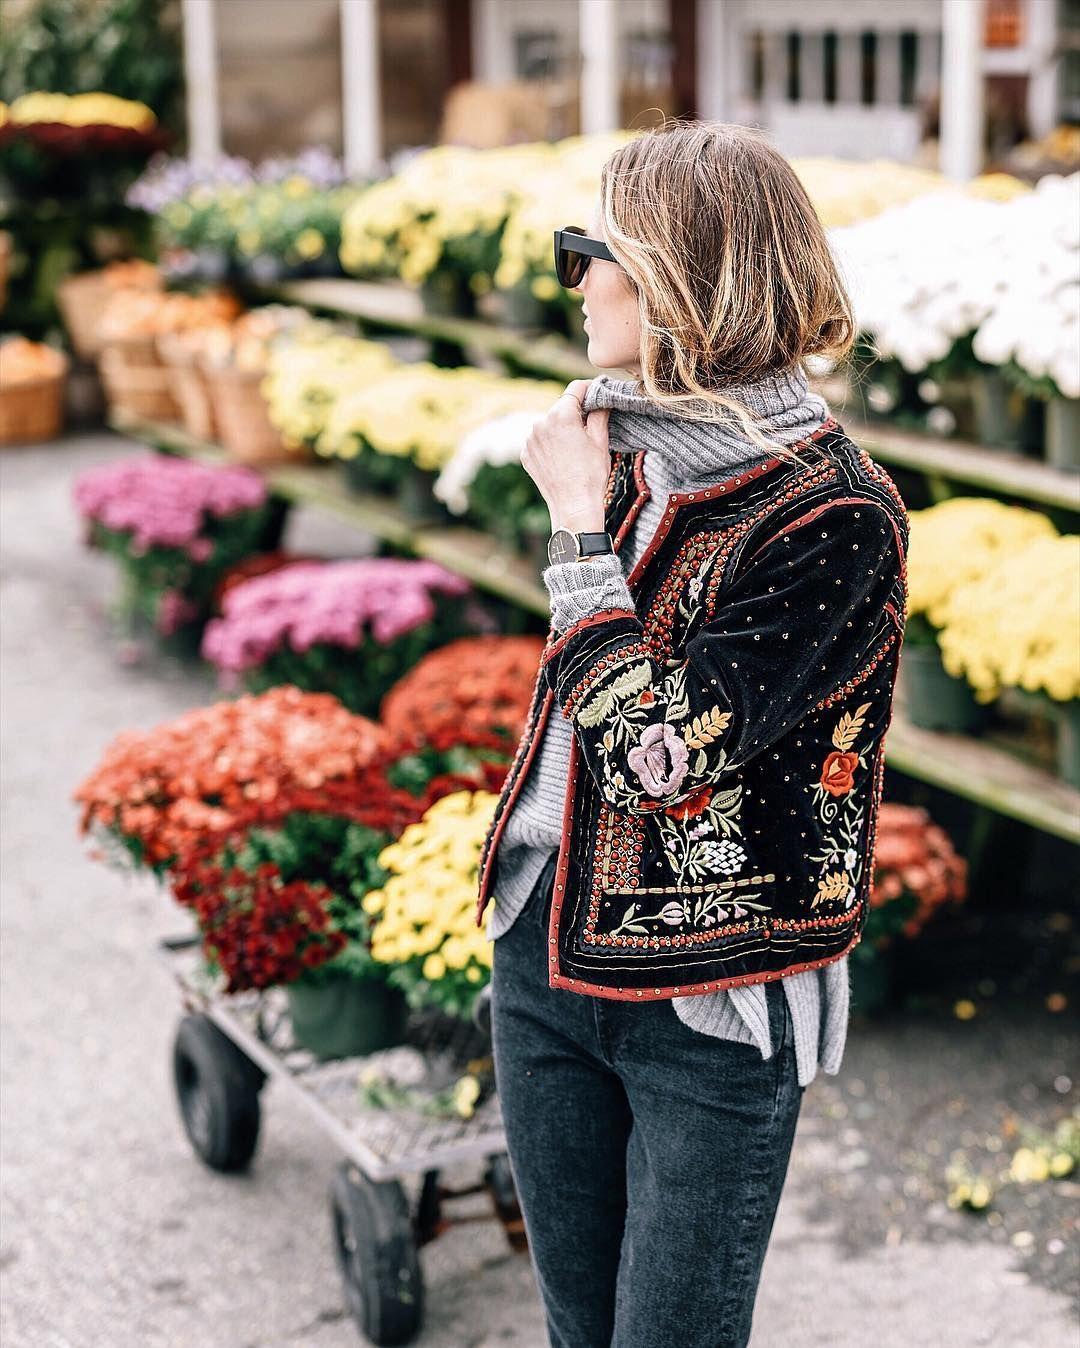 Jess Ann Kirby in Autumn Cashmere Boxy Shaker Cowl Sweater